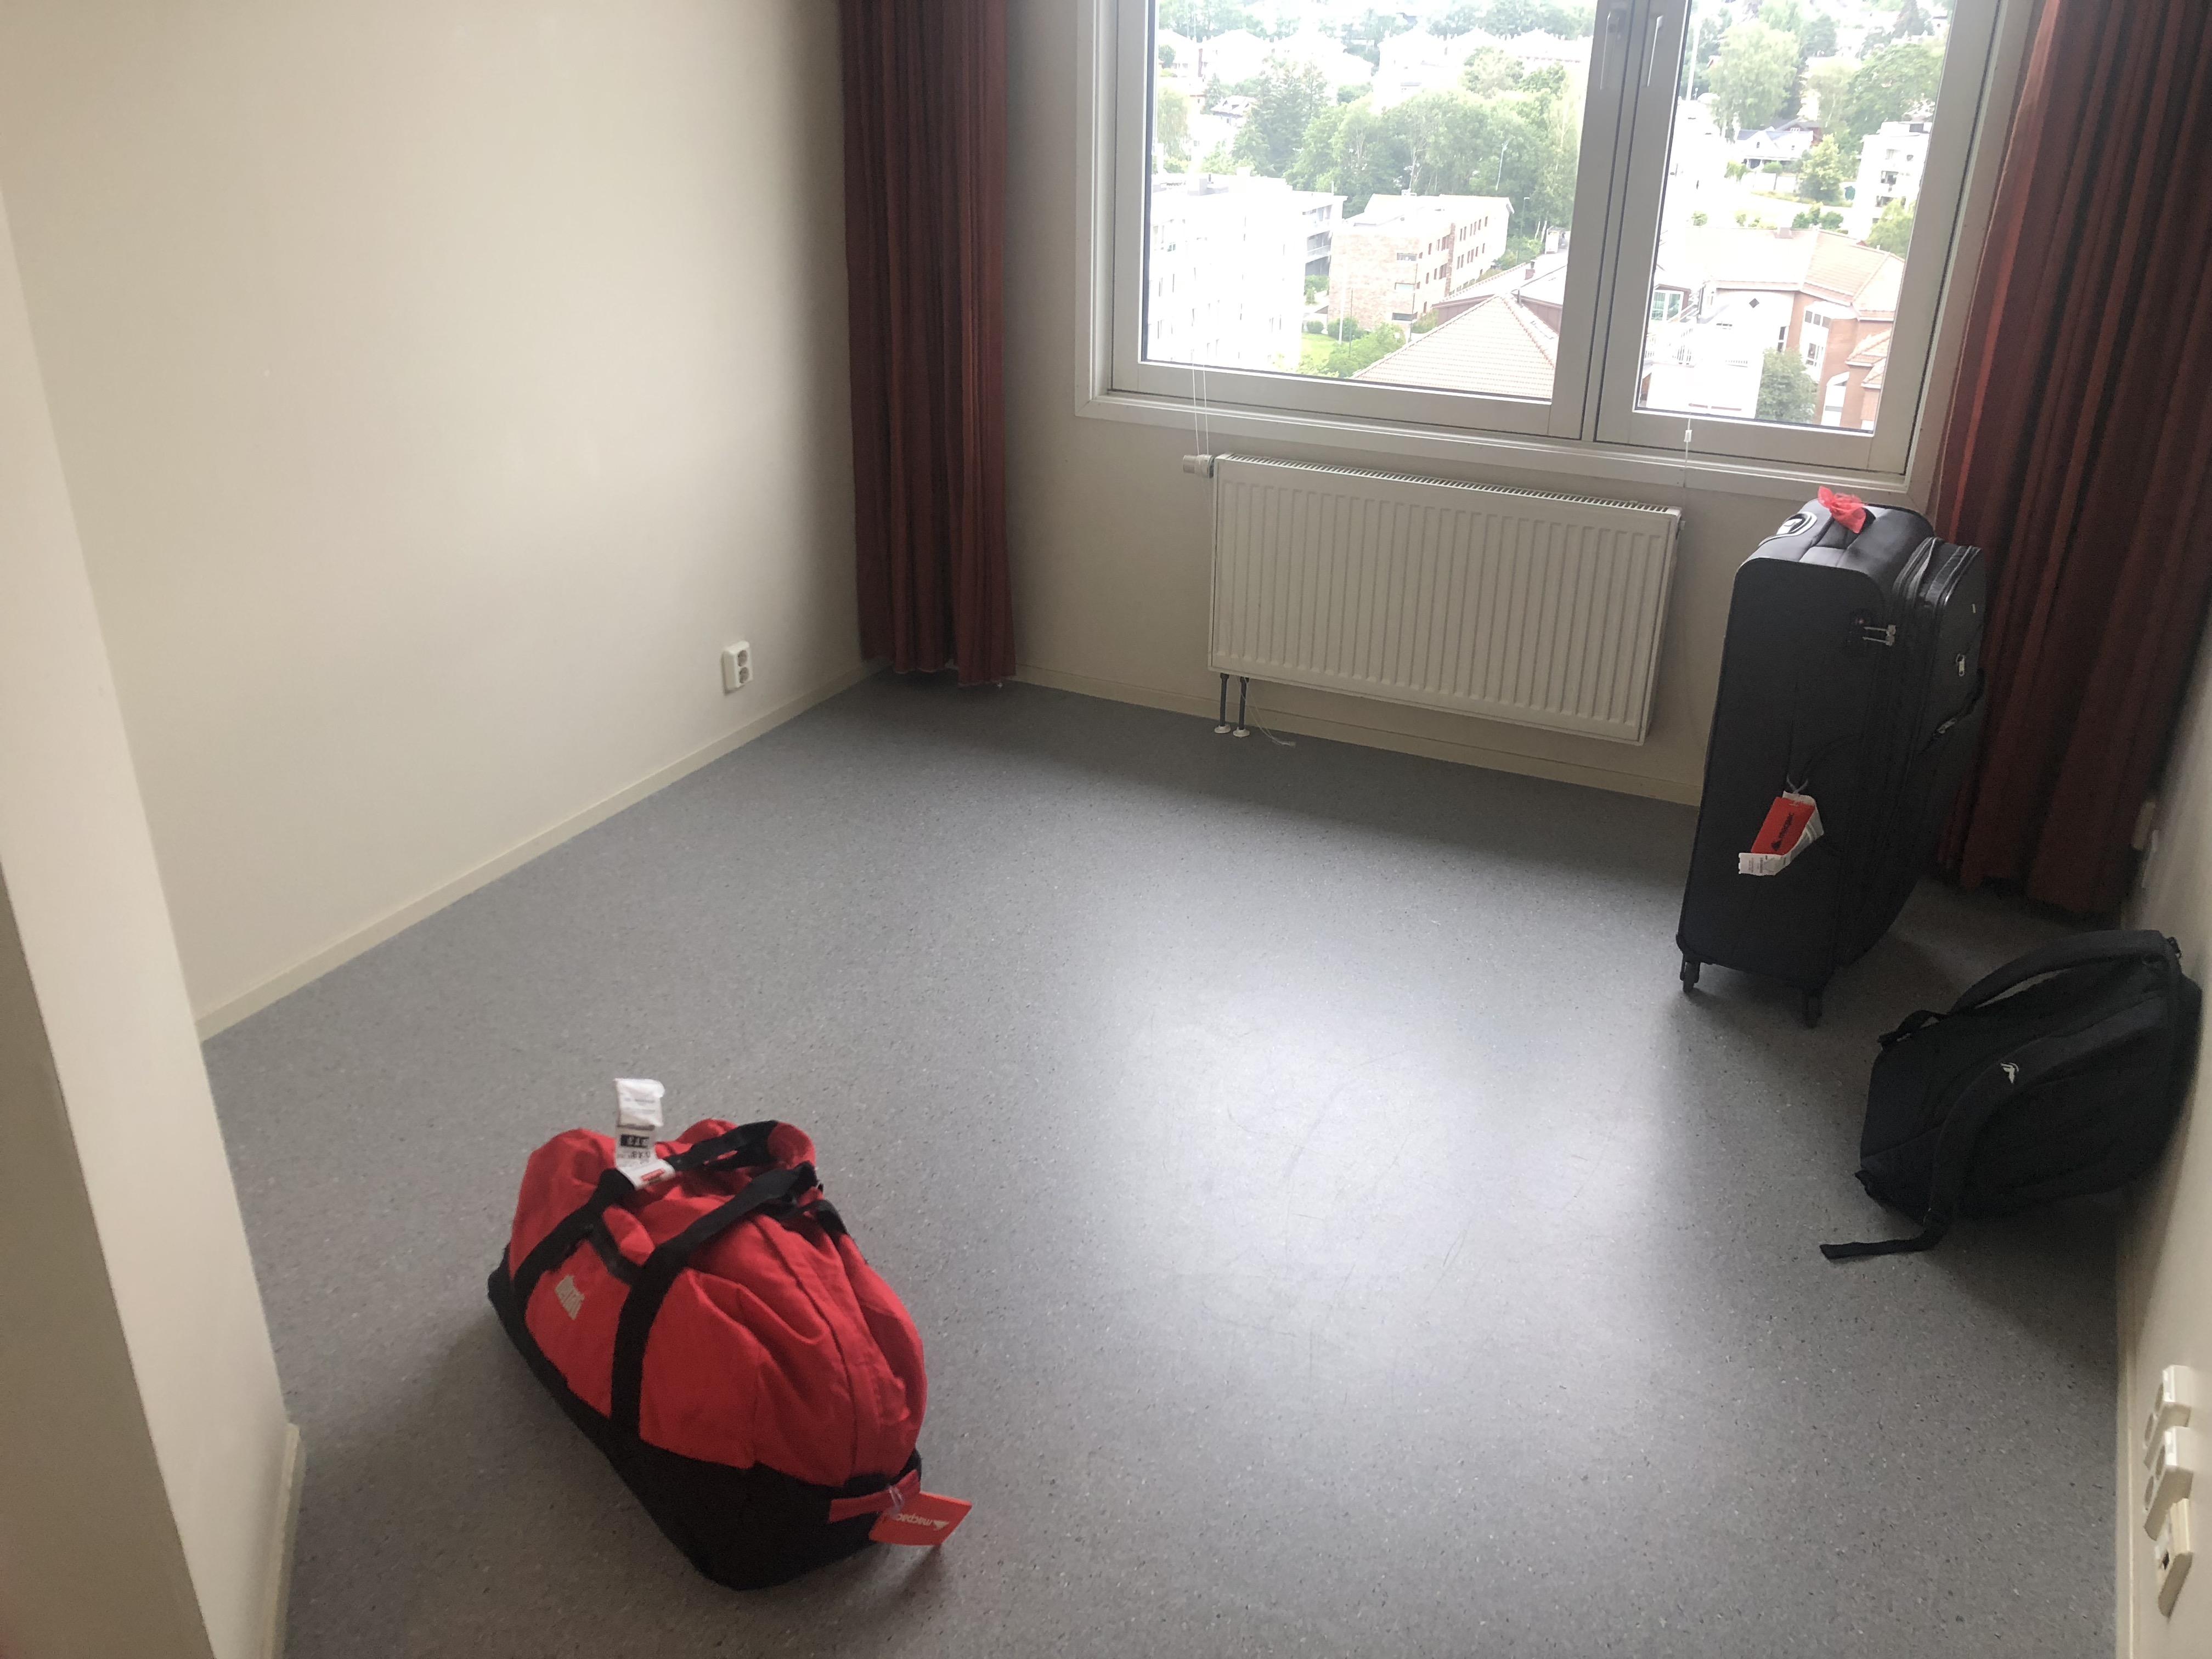 Day 1 at Bjølsen Studentby